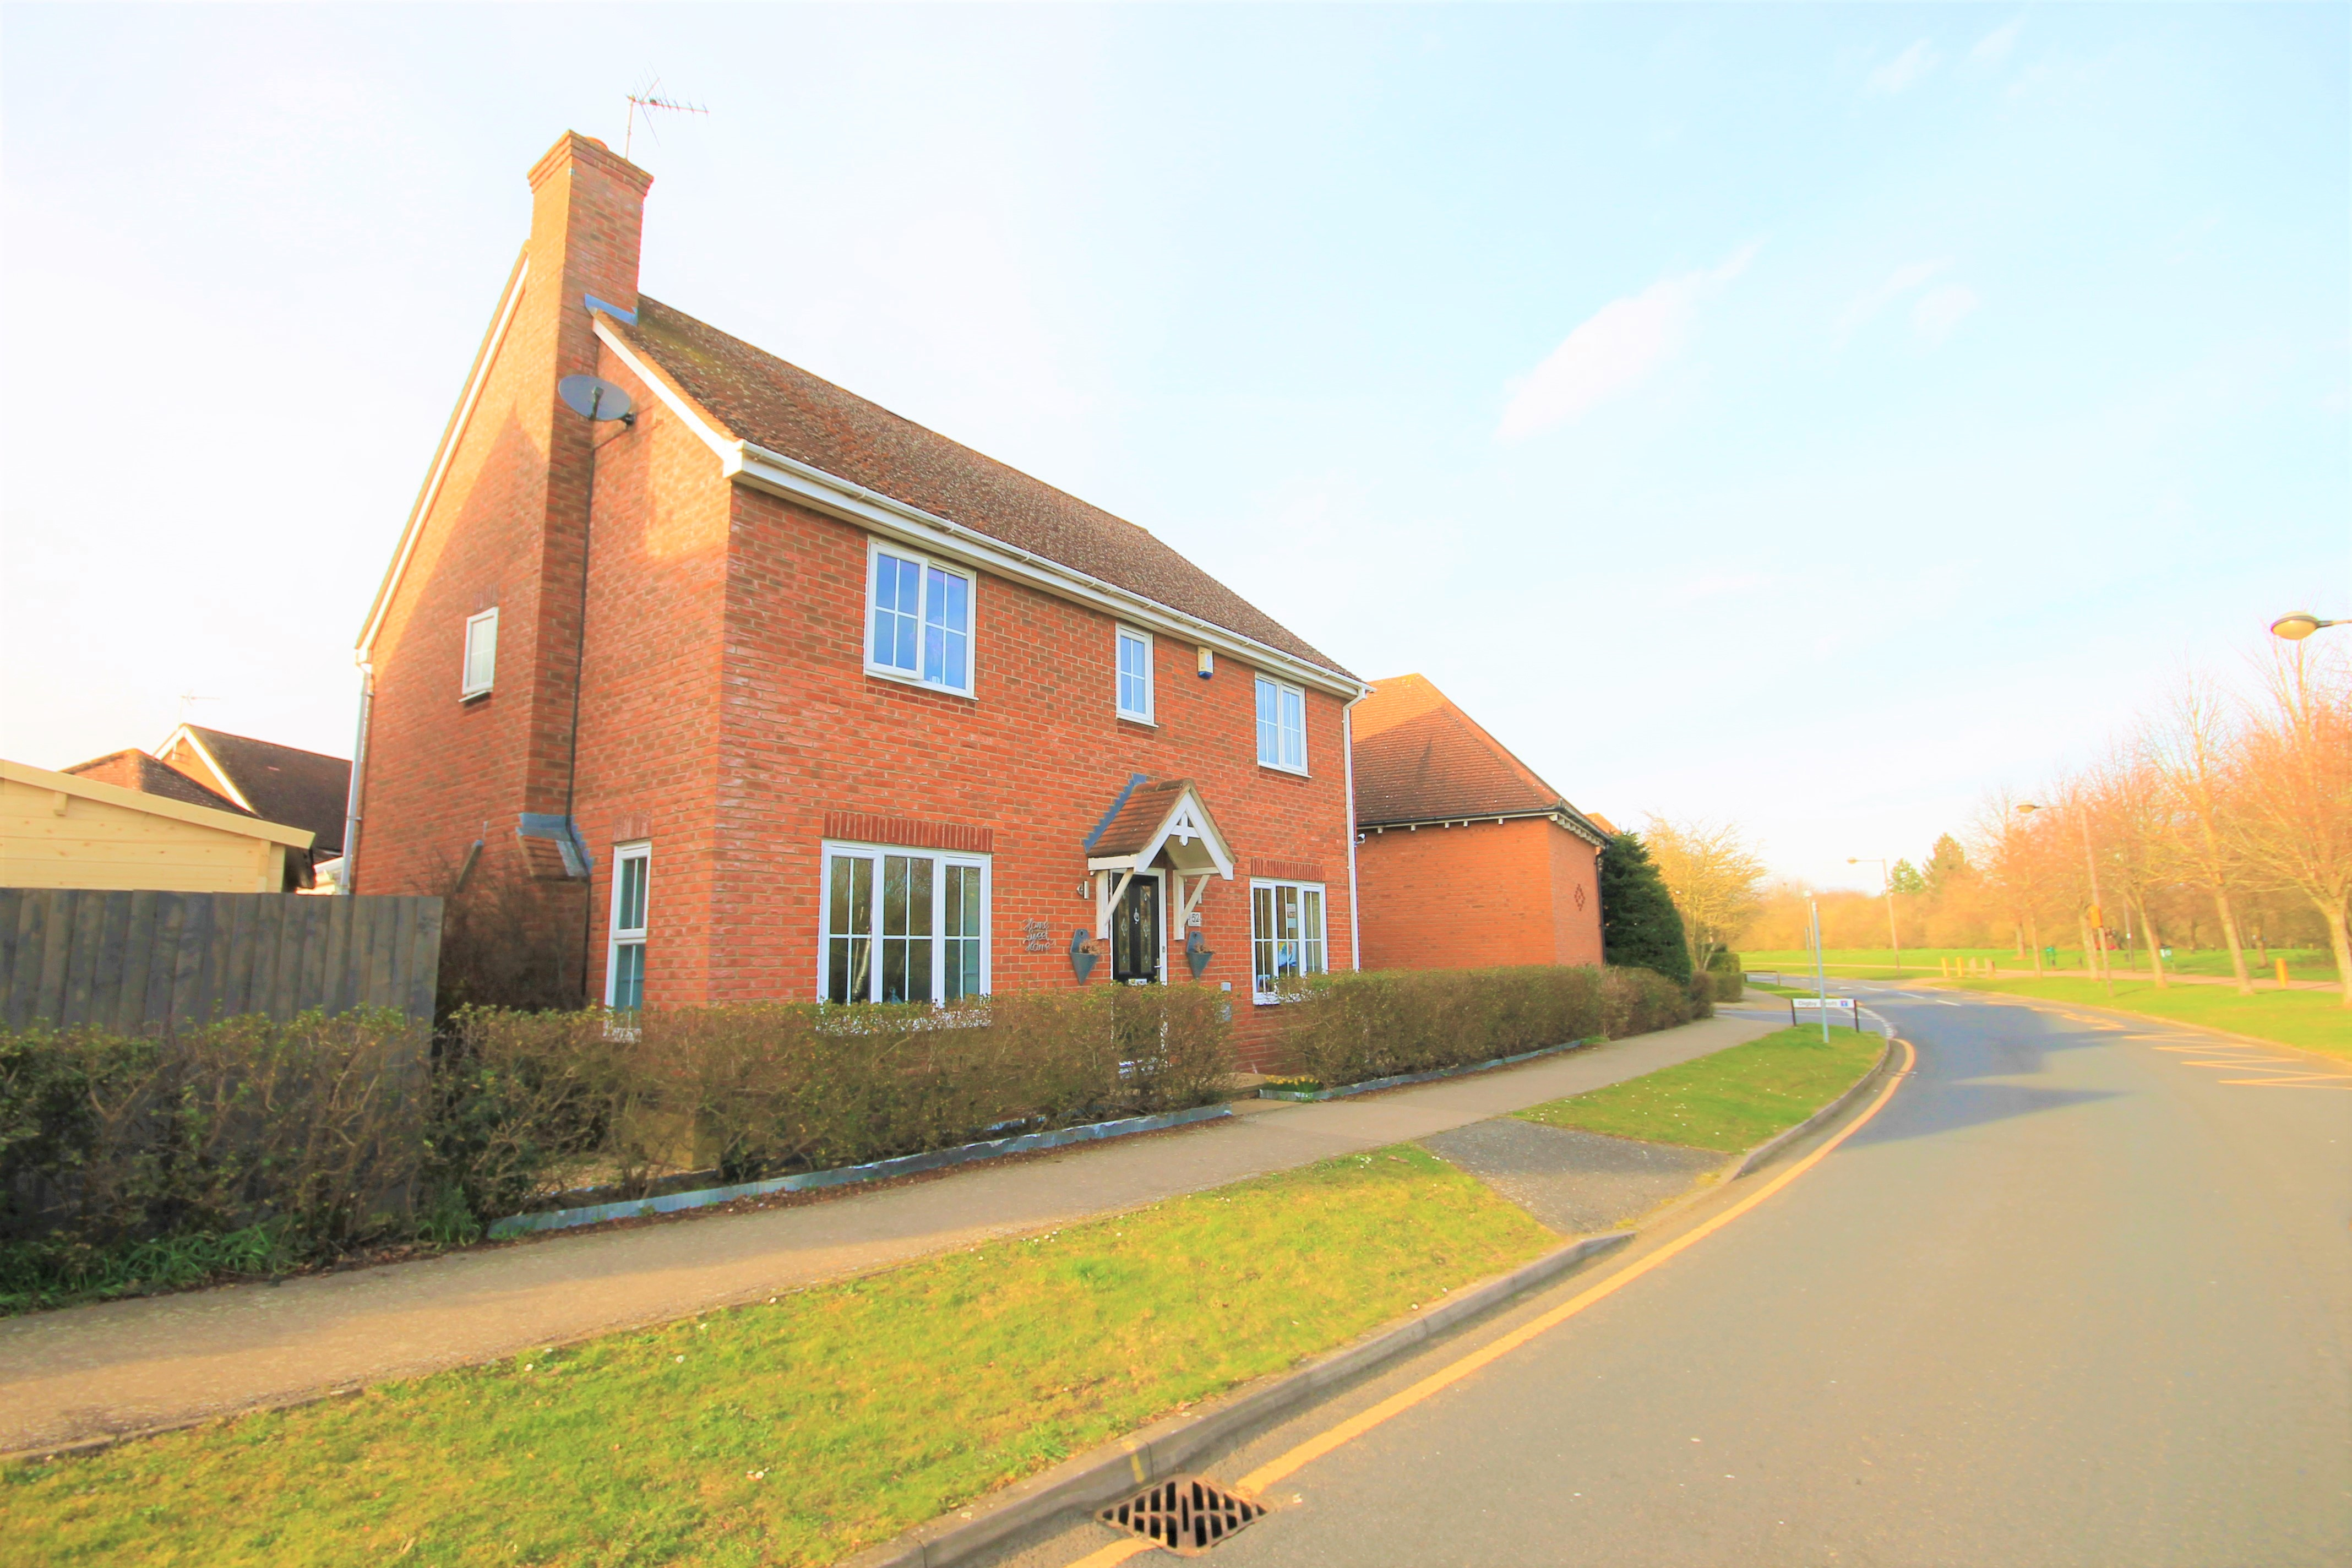 Noon Layer Drive, Milton Keynes, Buckinghamshire Image